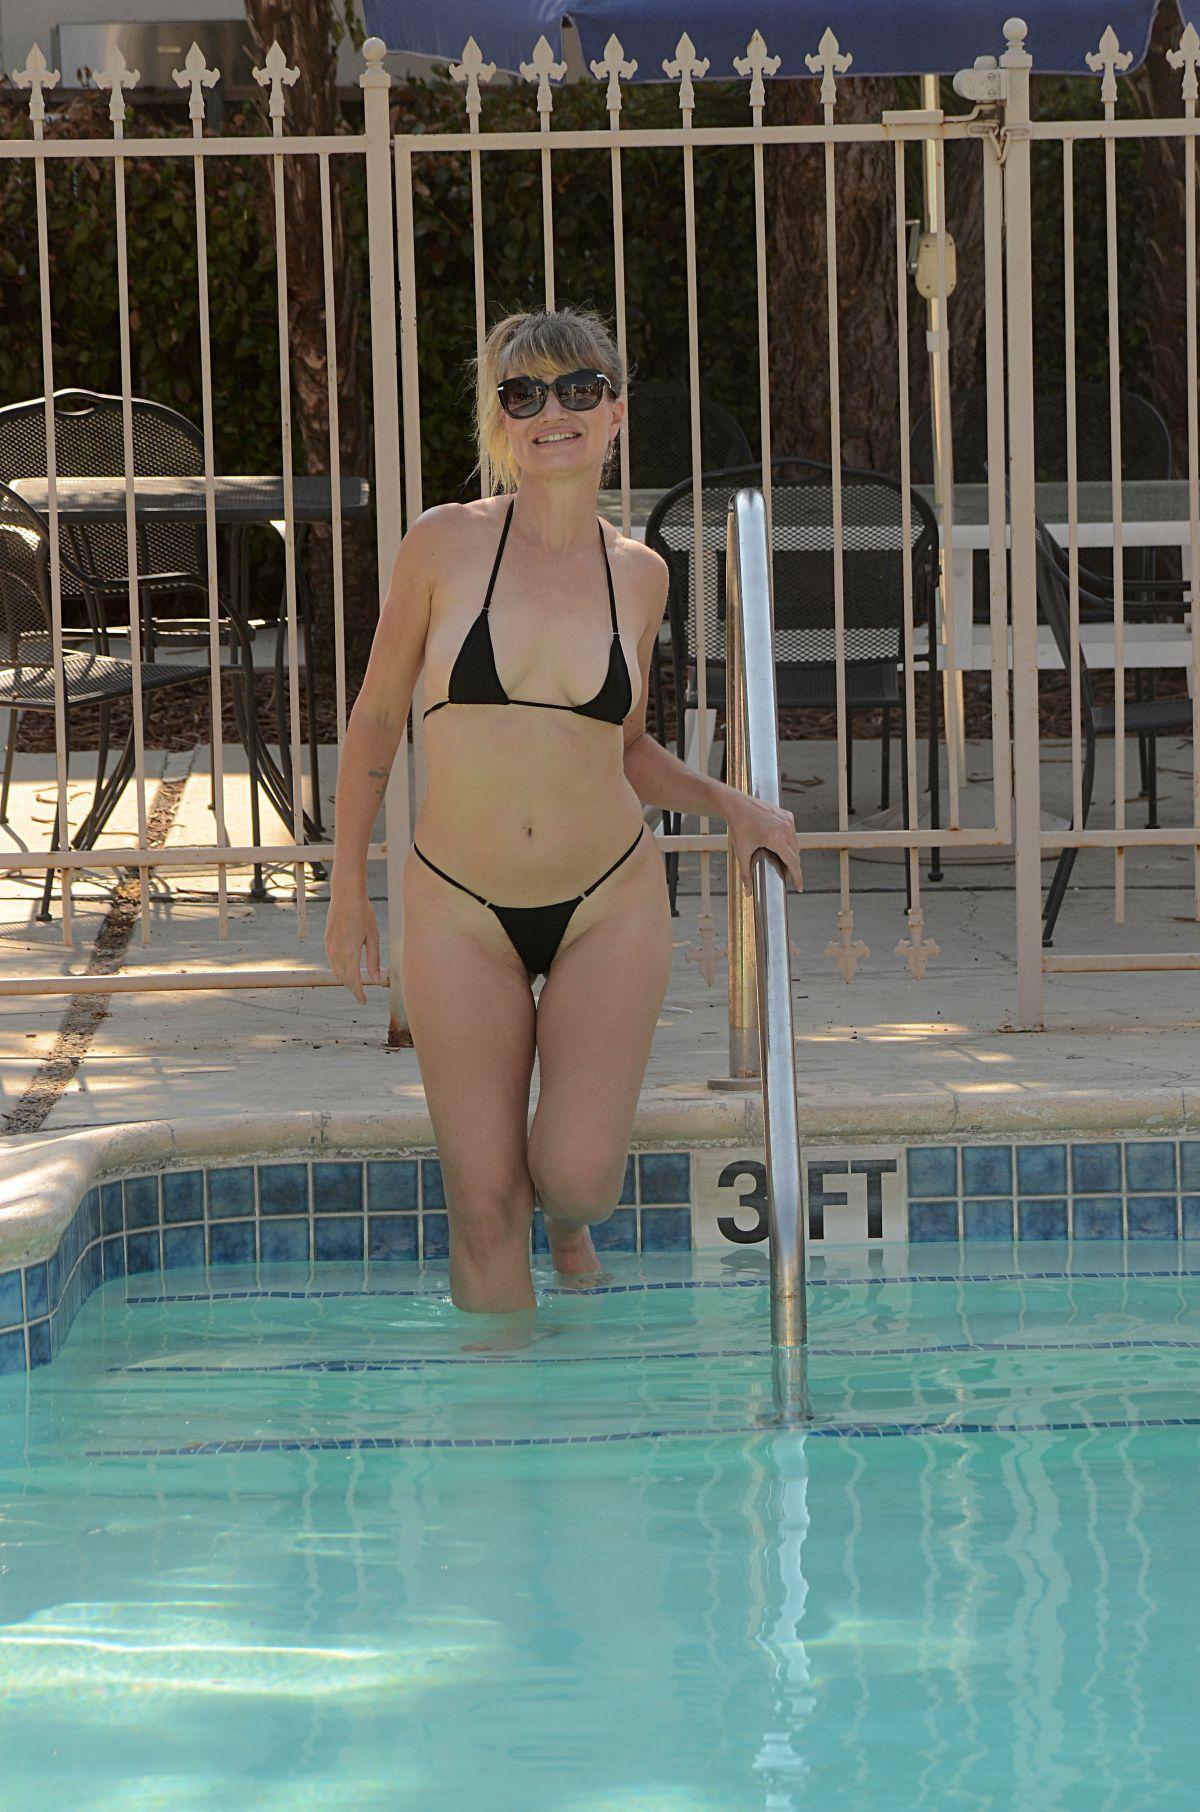 Youtube Allie Leggett nudes (36 photos), Ass, Paparazzi, Selfie, swimsuit 2015